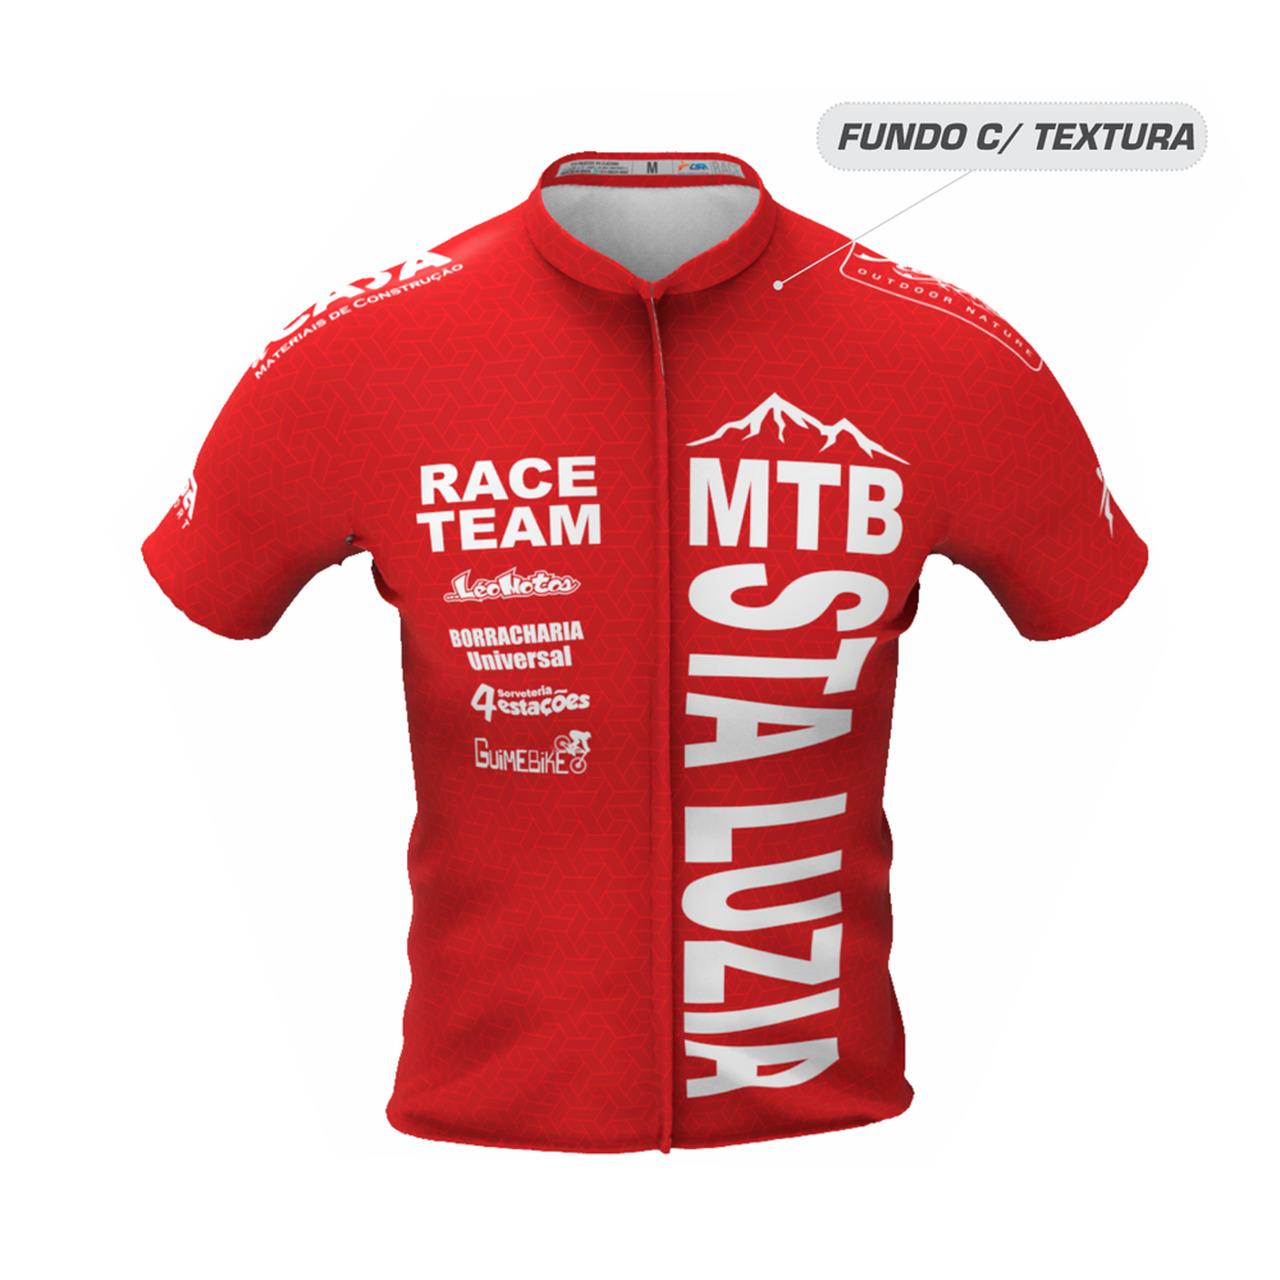 Camisa Personalizada MTB Santa Luzia  - Mostruário CSA Sport